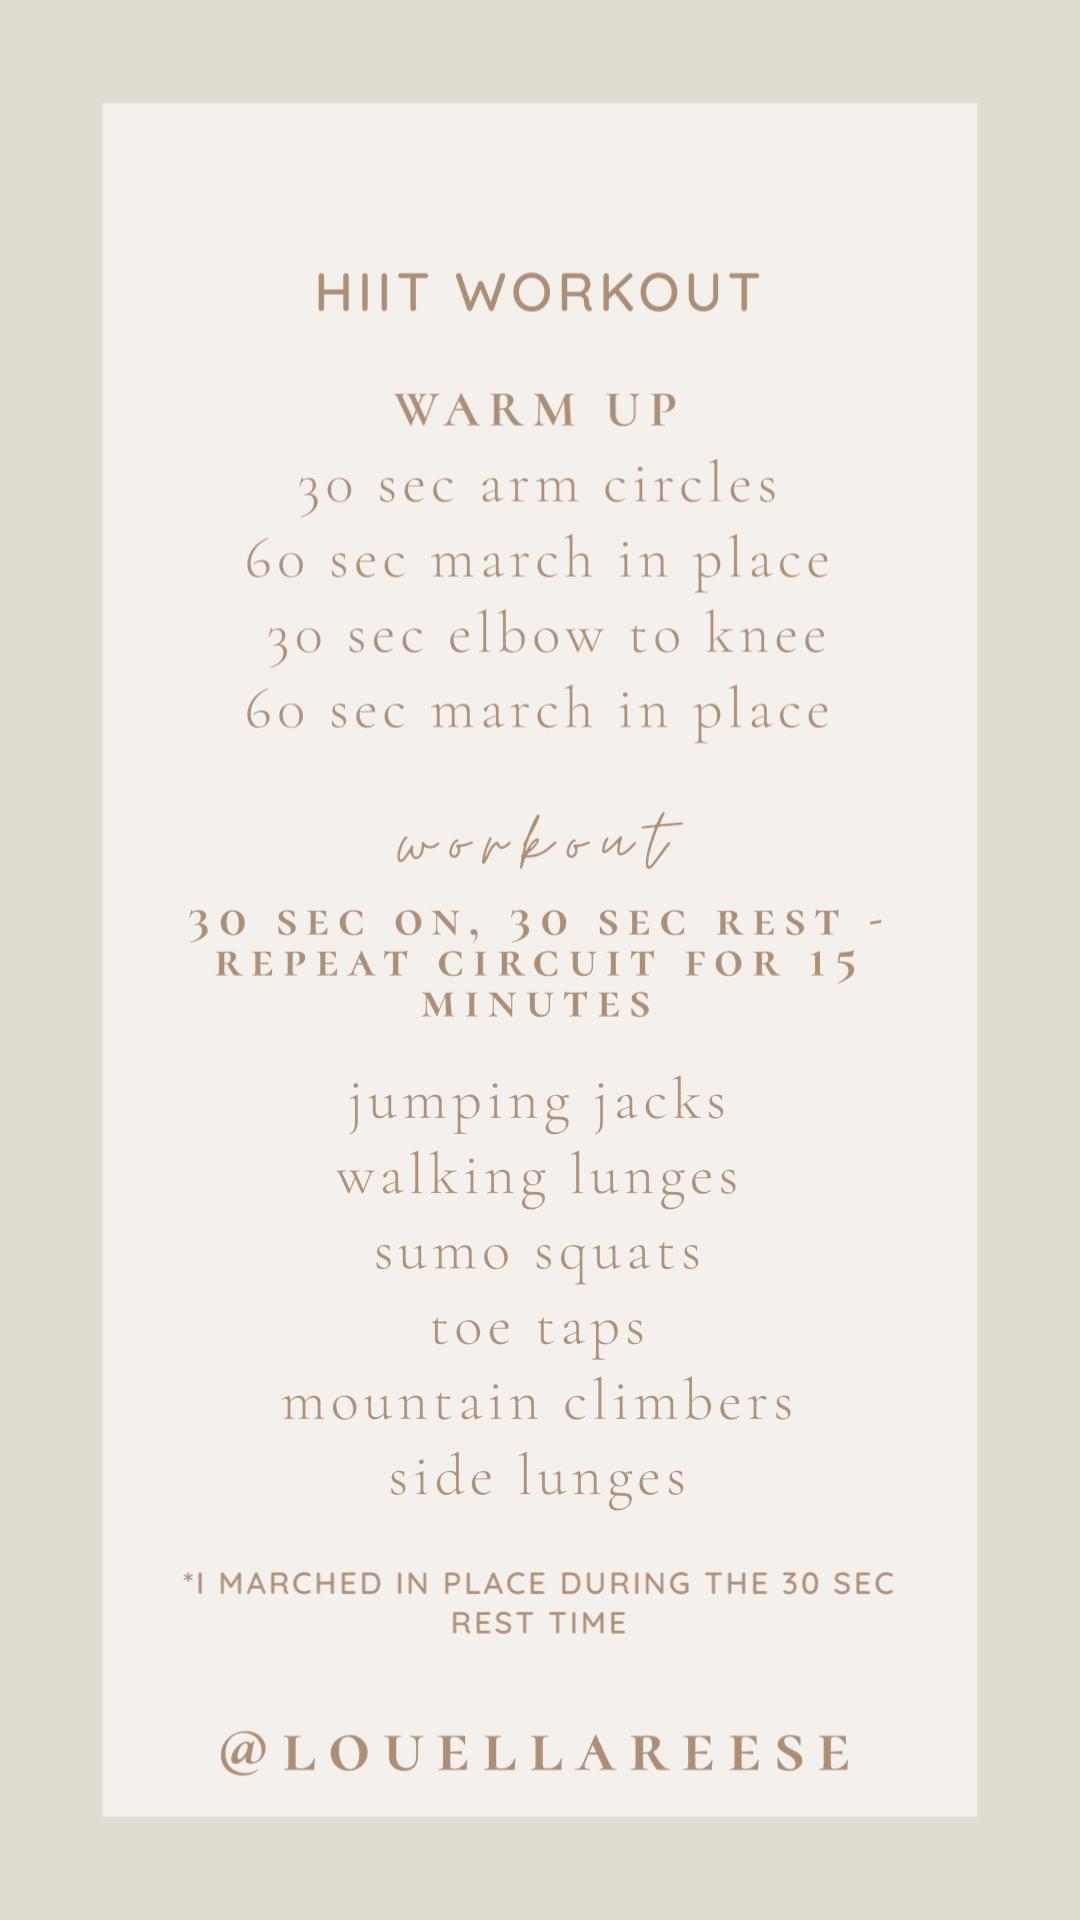 FWTFL HIIT Workouts | Lifestyle | Louella Reese